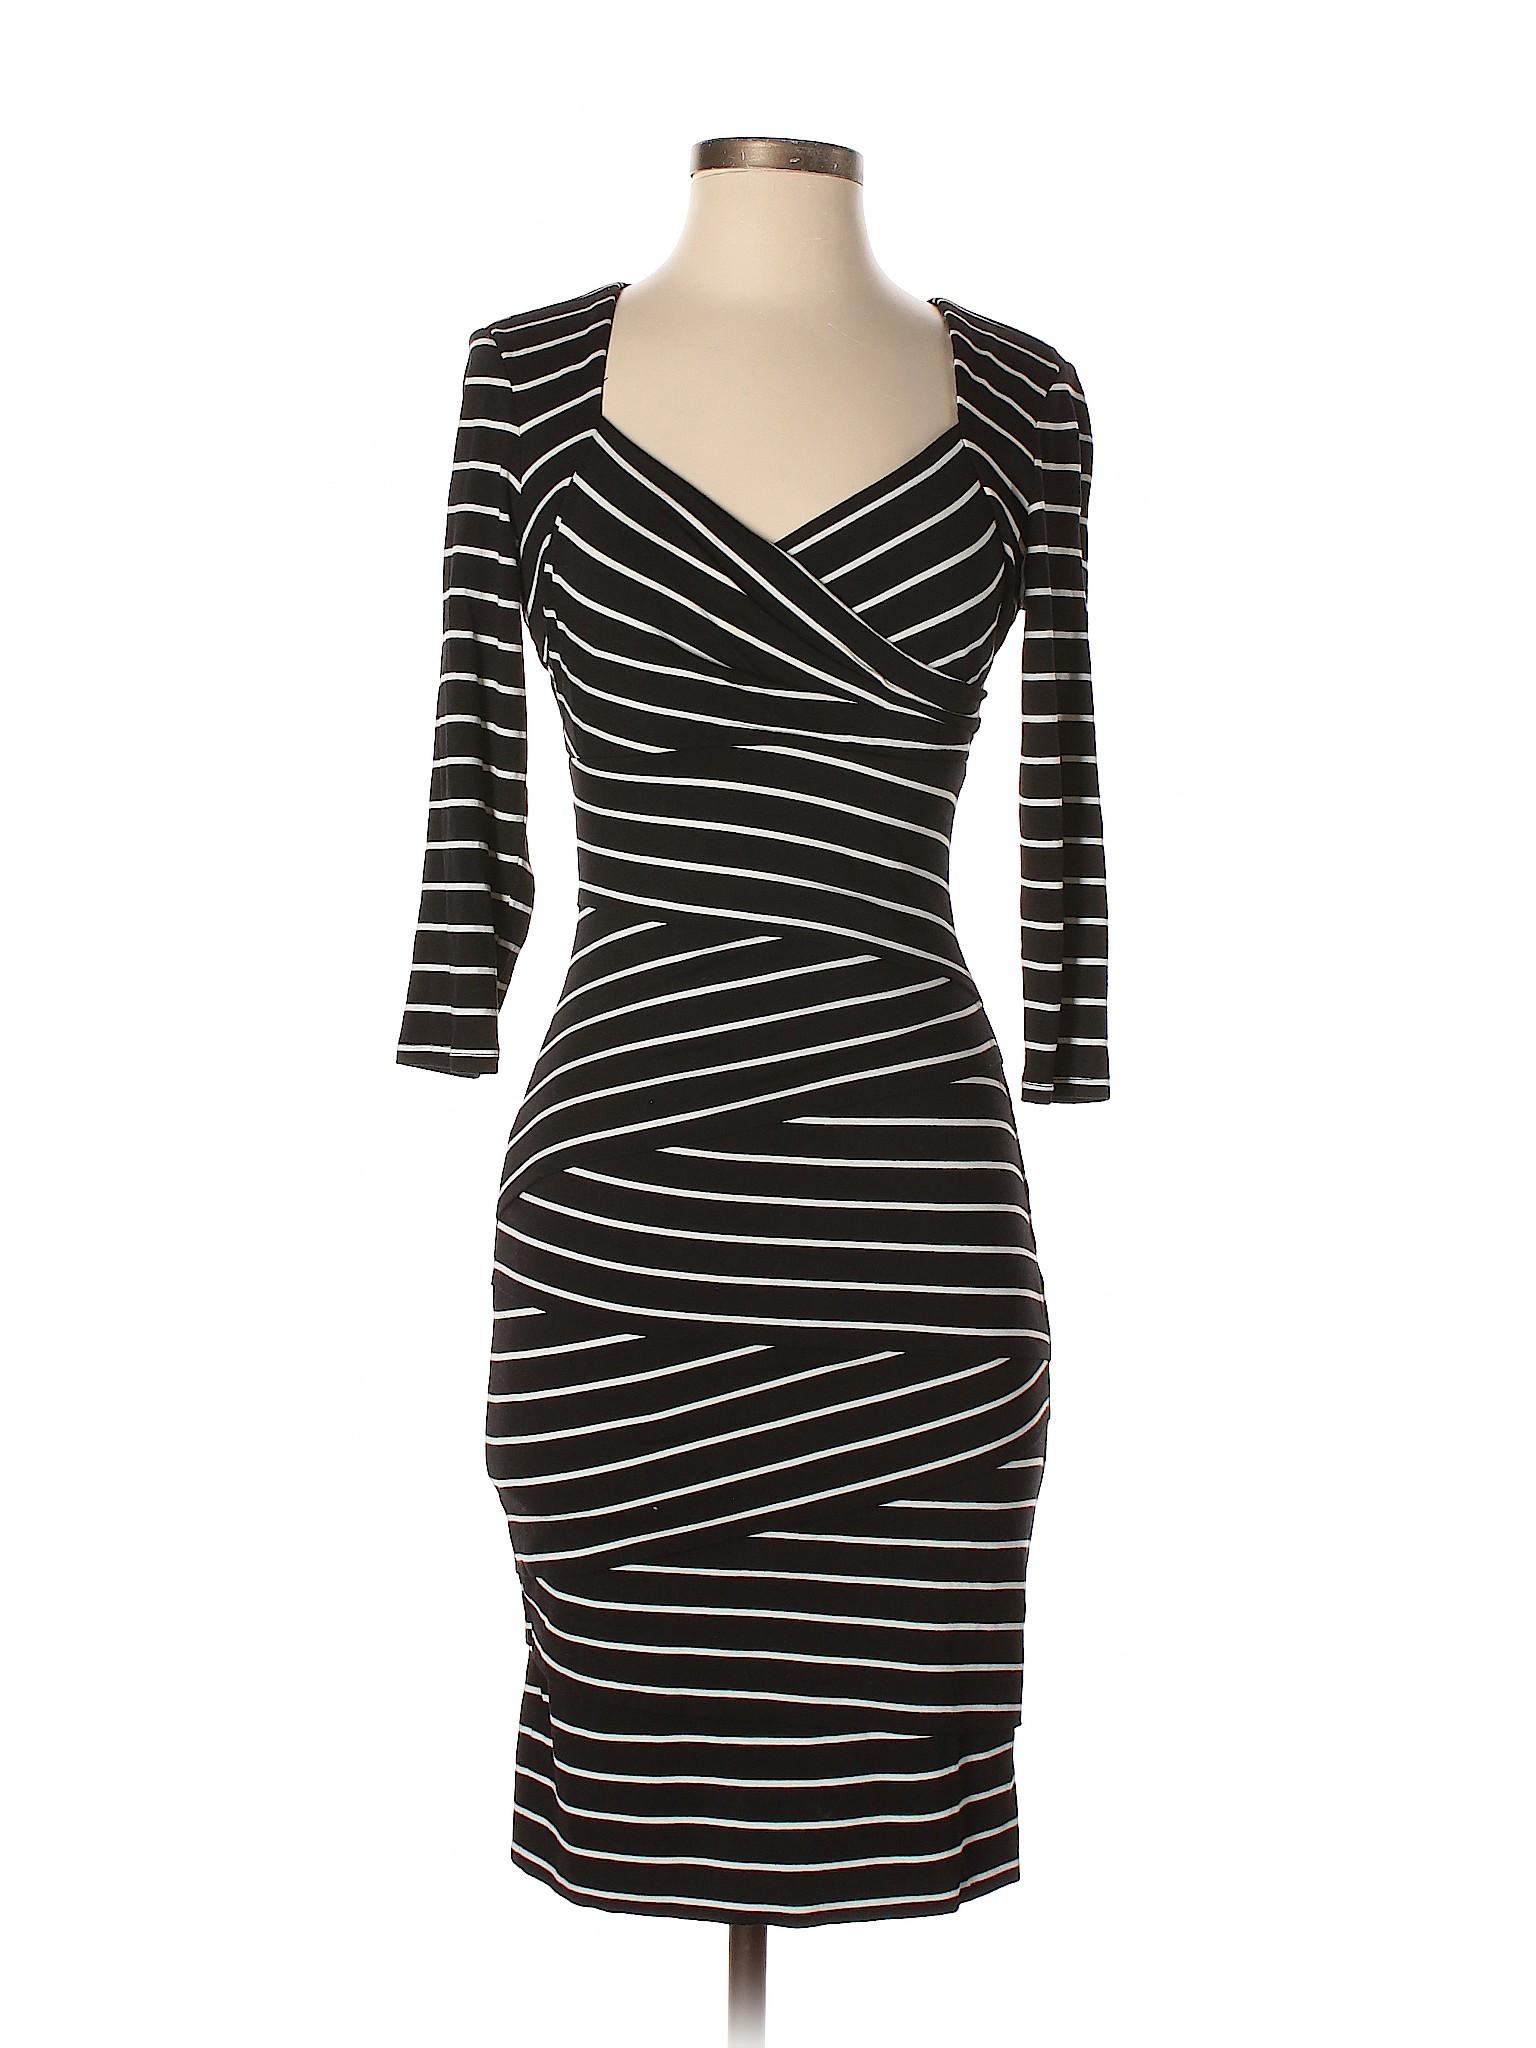 White Market Selling House Casual Black Dress pCxqwOx